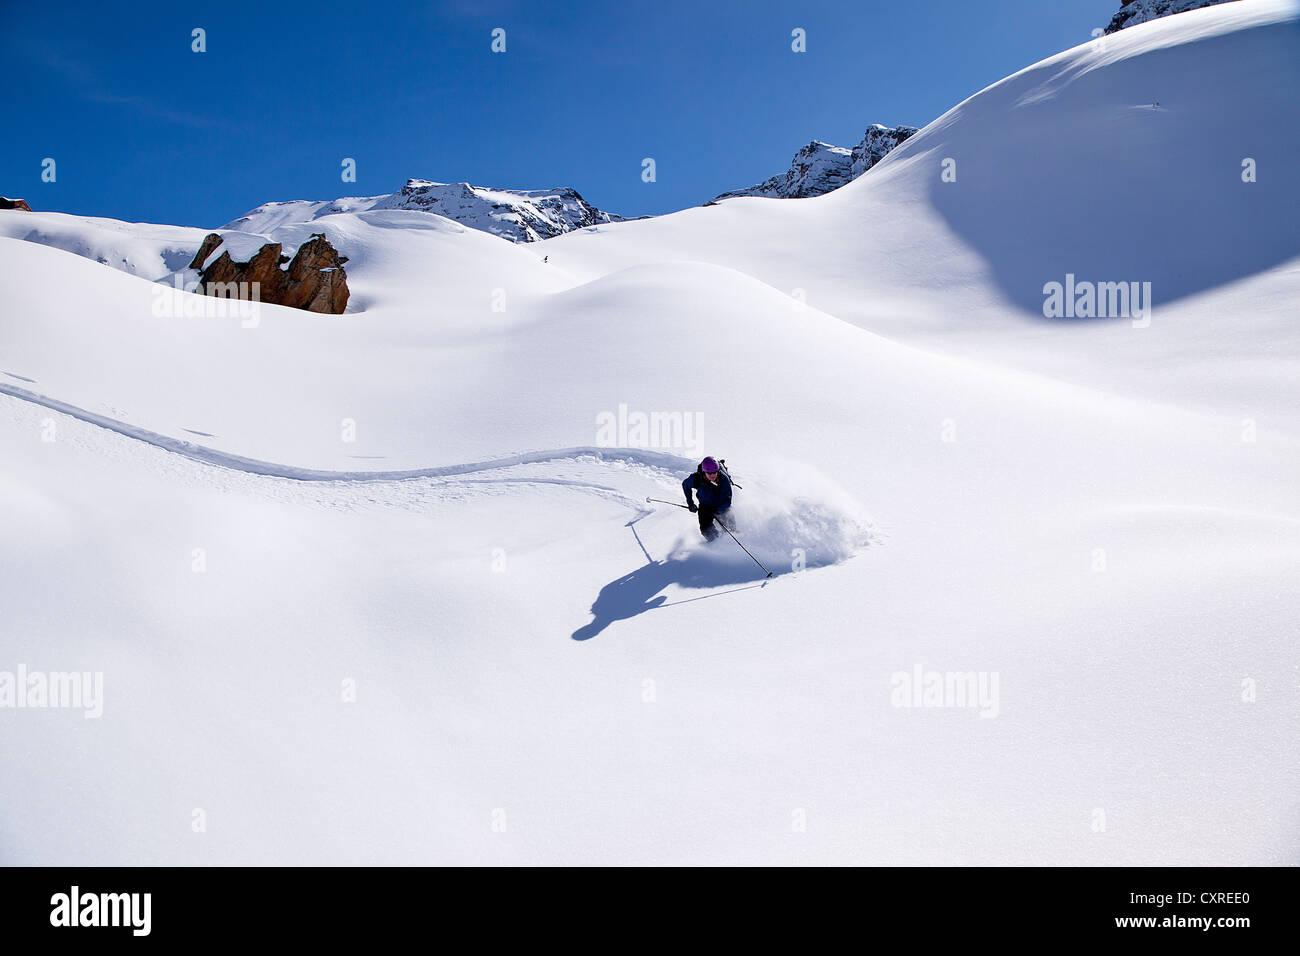 Skier downhill skiing in deep powder snow, Ahornspitze mountain, Zillertal Alps, Zillertal valley, northern Tyrol, - Stock Image